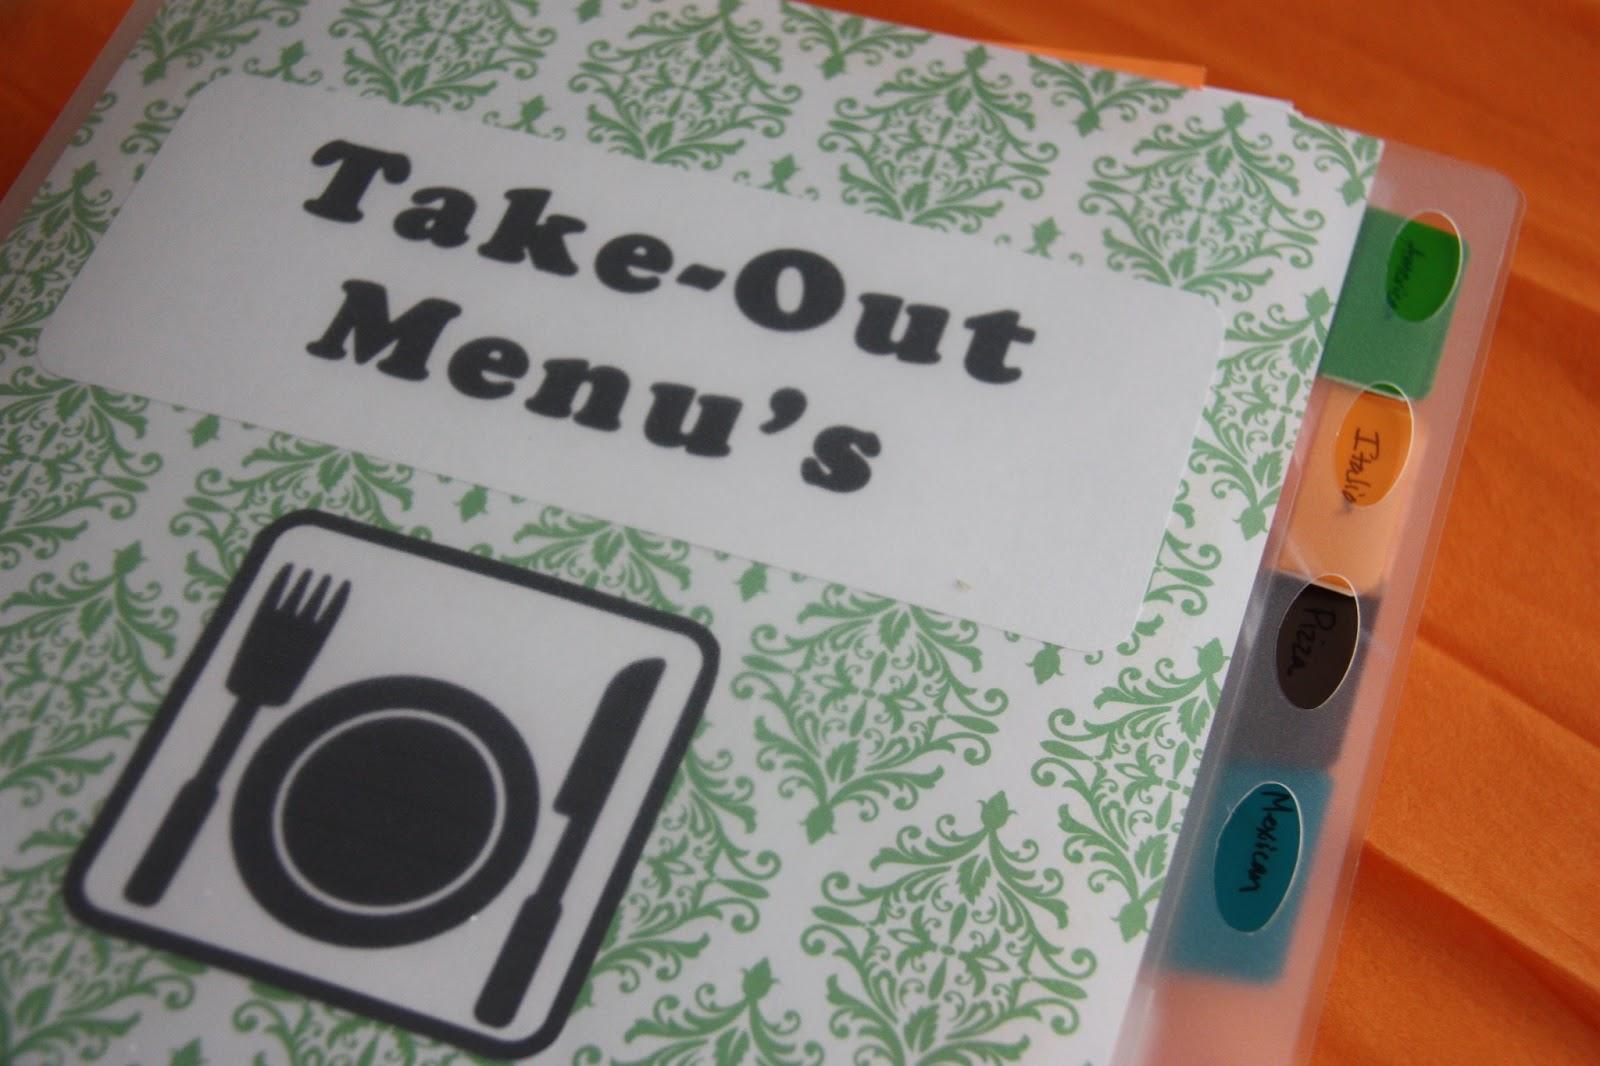 Take Out Menu Organization - The Lovebugs Blog